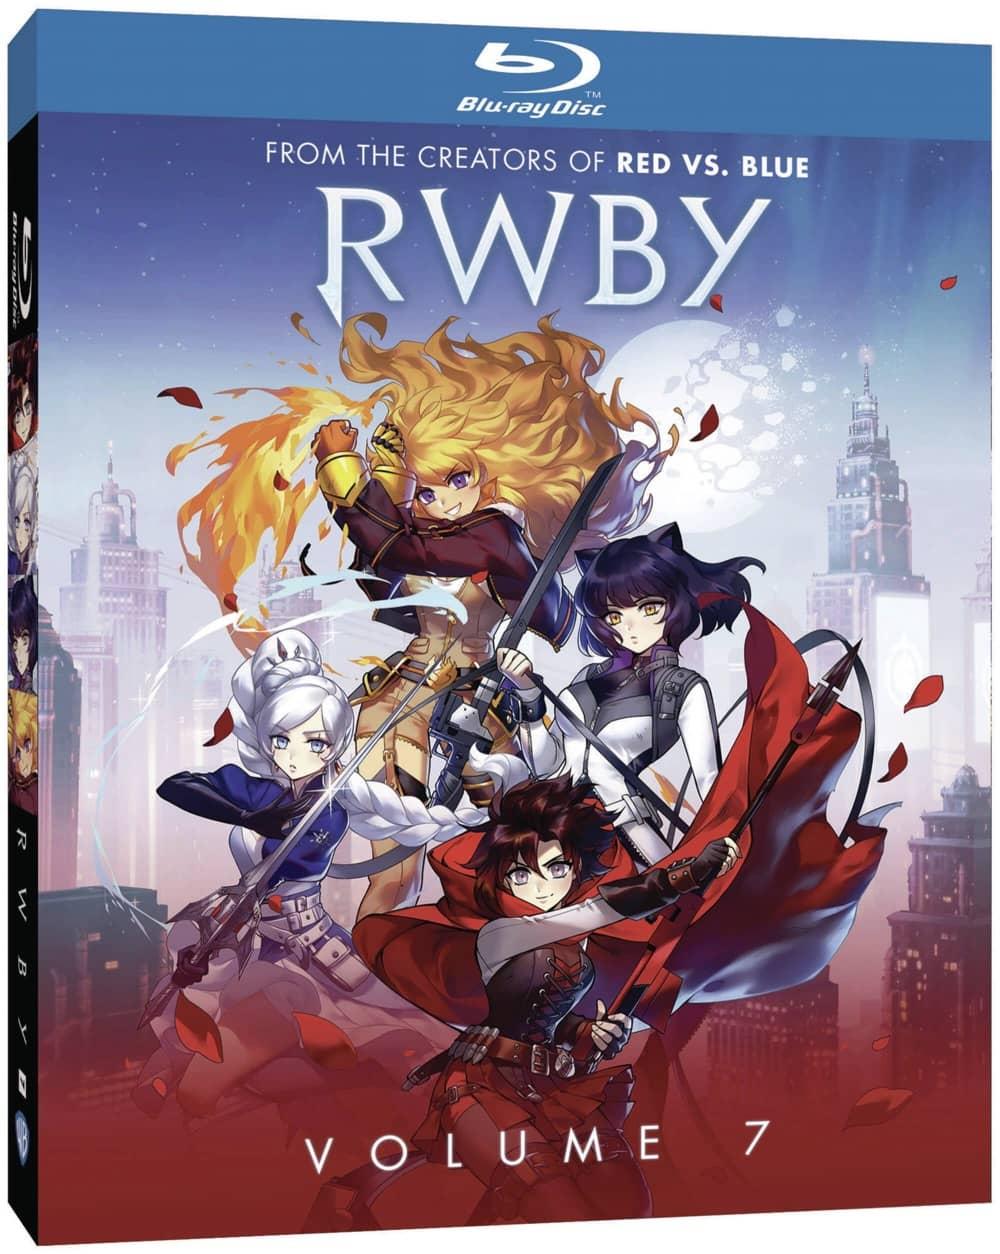 RWBY Volume 7 Bluray Cover